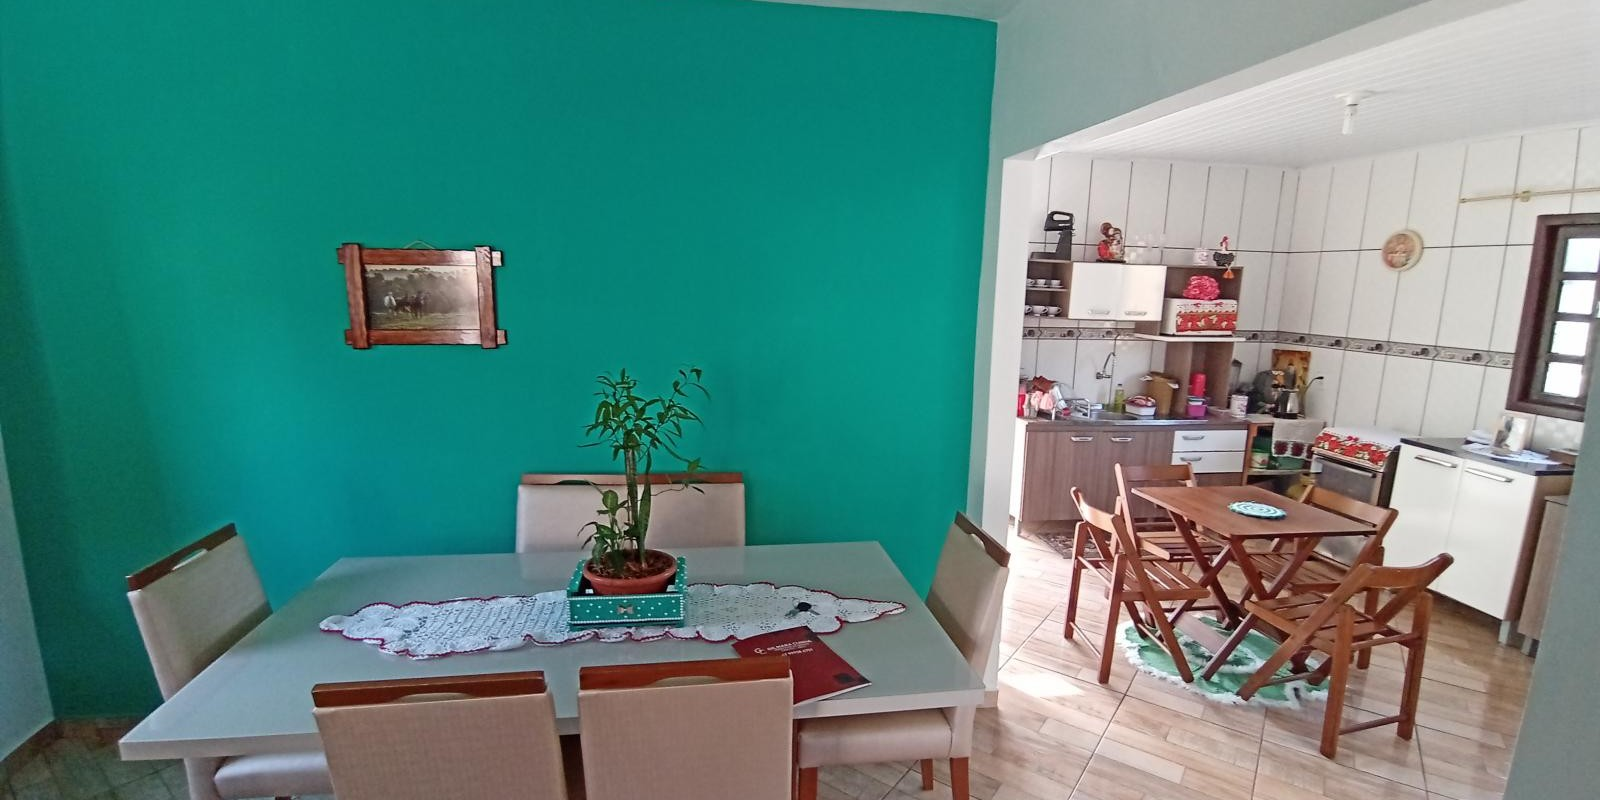 Casa muito Aconchegante - Foto 4 de 9